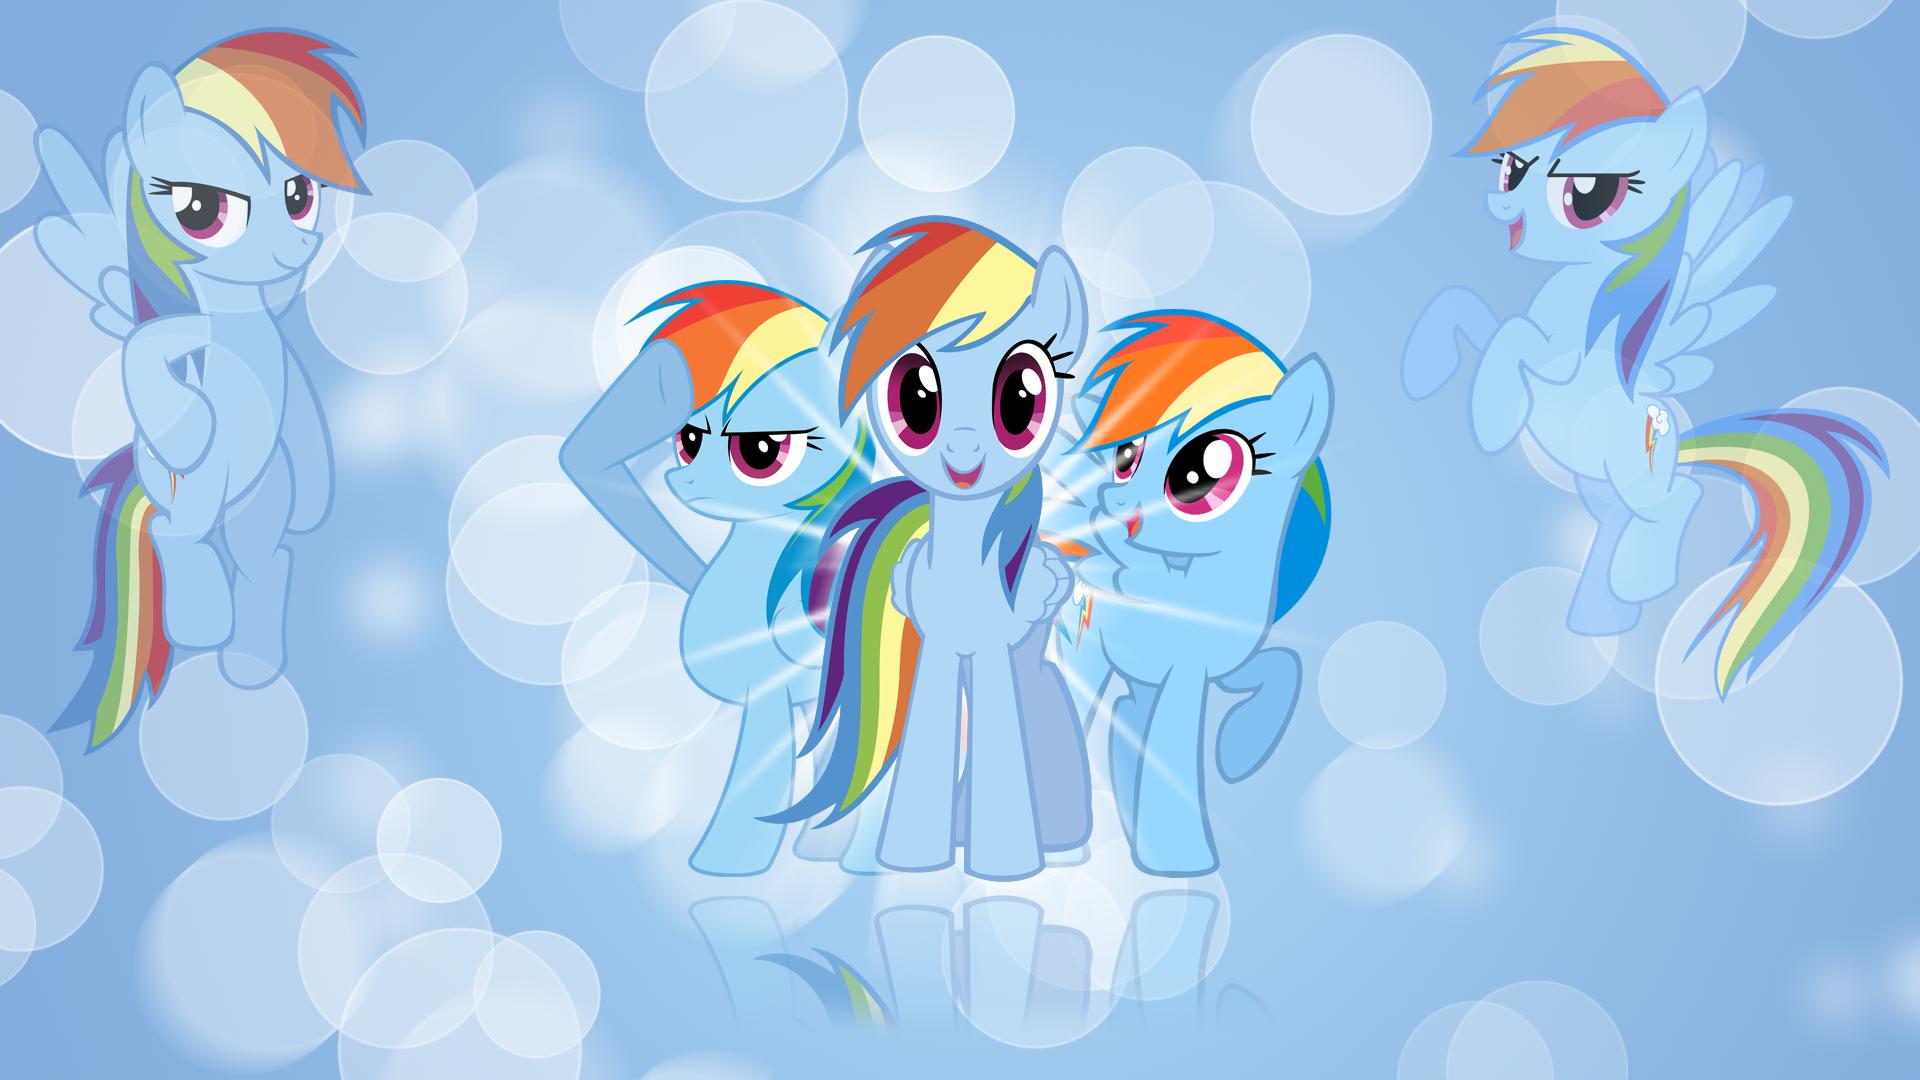 Rainbow Dash 'Bubbles!' Wallpaper by BlueDragonHans, CSMLP, kitsuneymg, MaximillianVeers, Nethear and Squirrel734